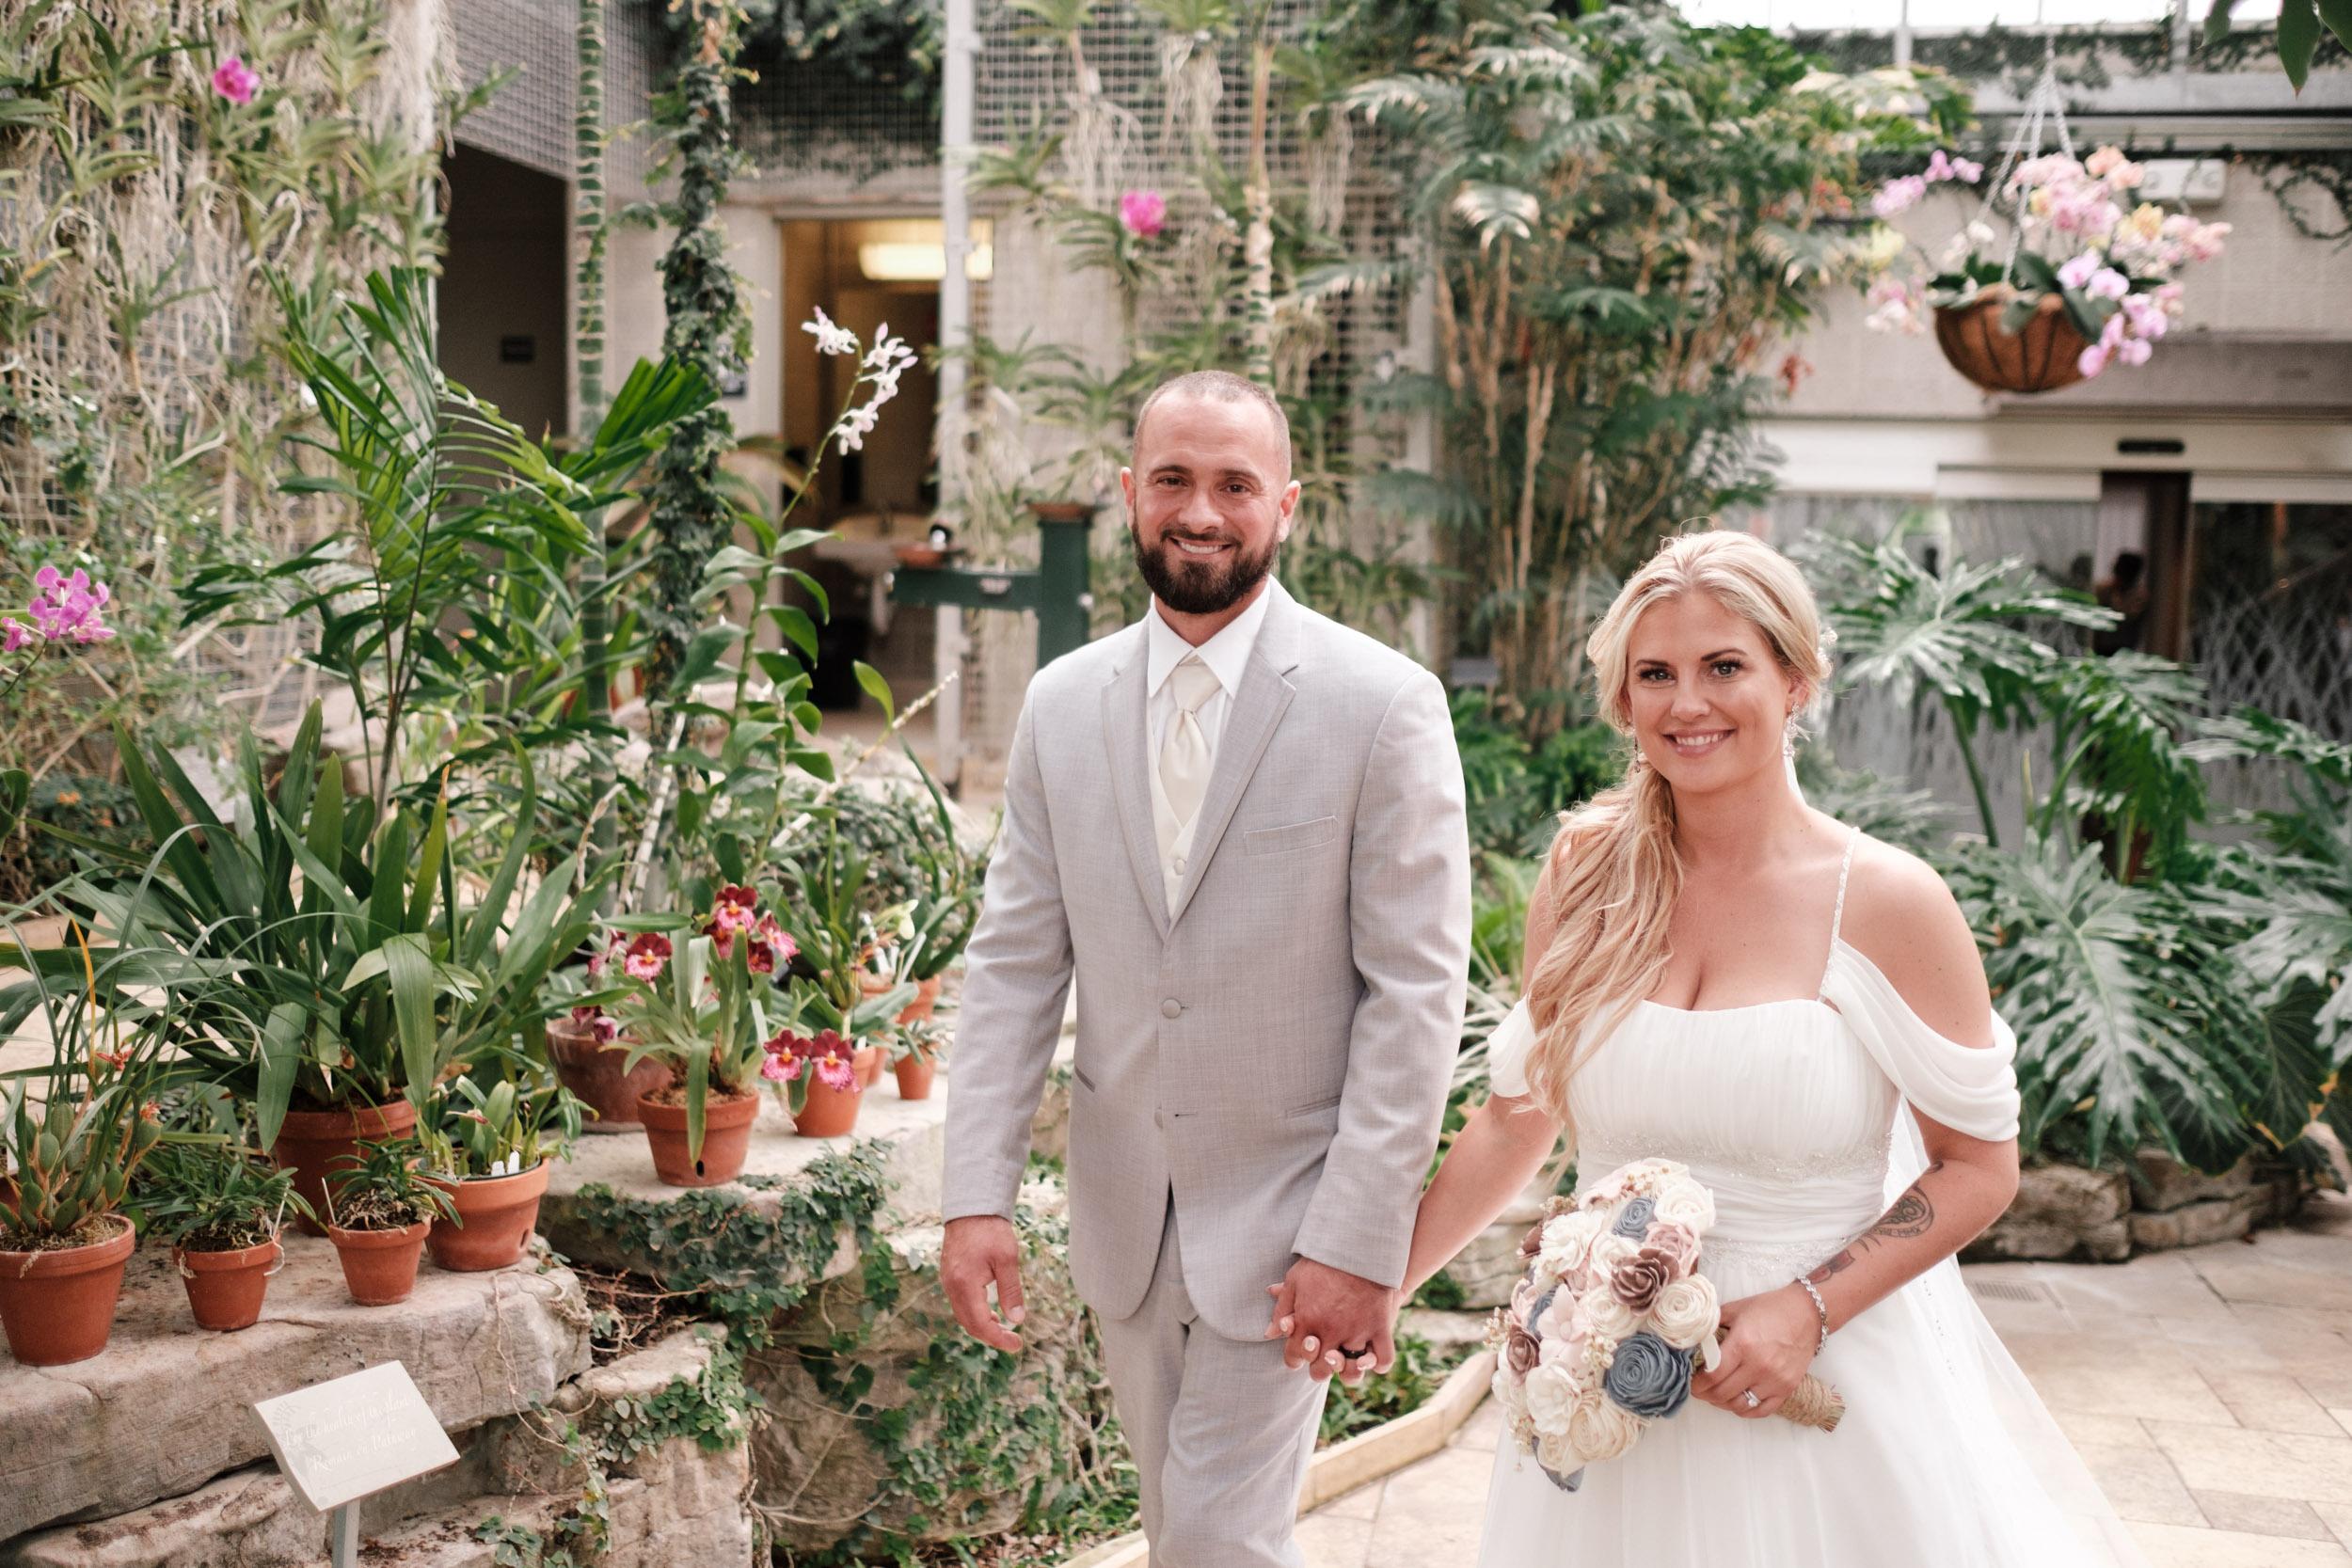 19-06-01 Megan Josh - Nicholas Conservatory Wedding-36.jpg